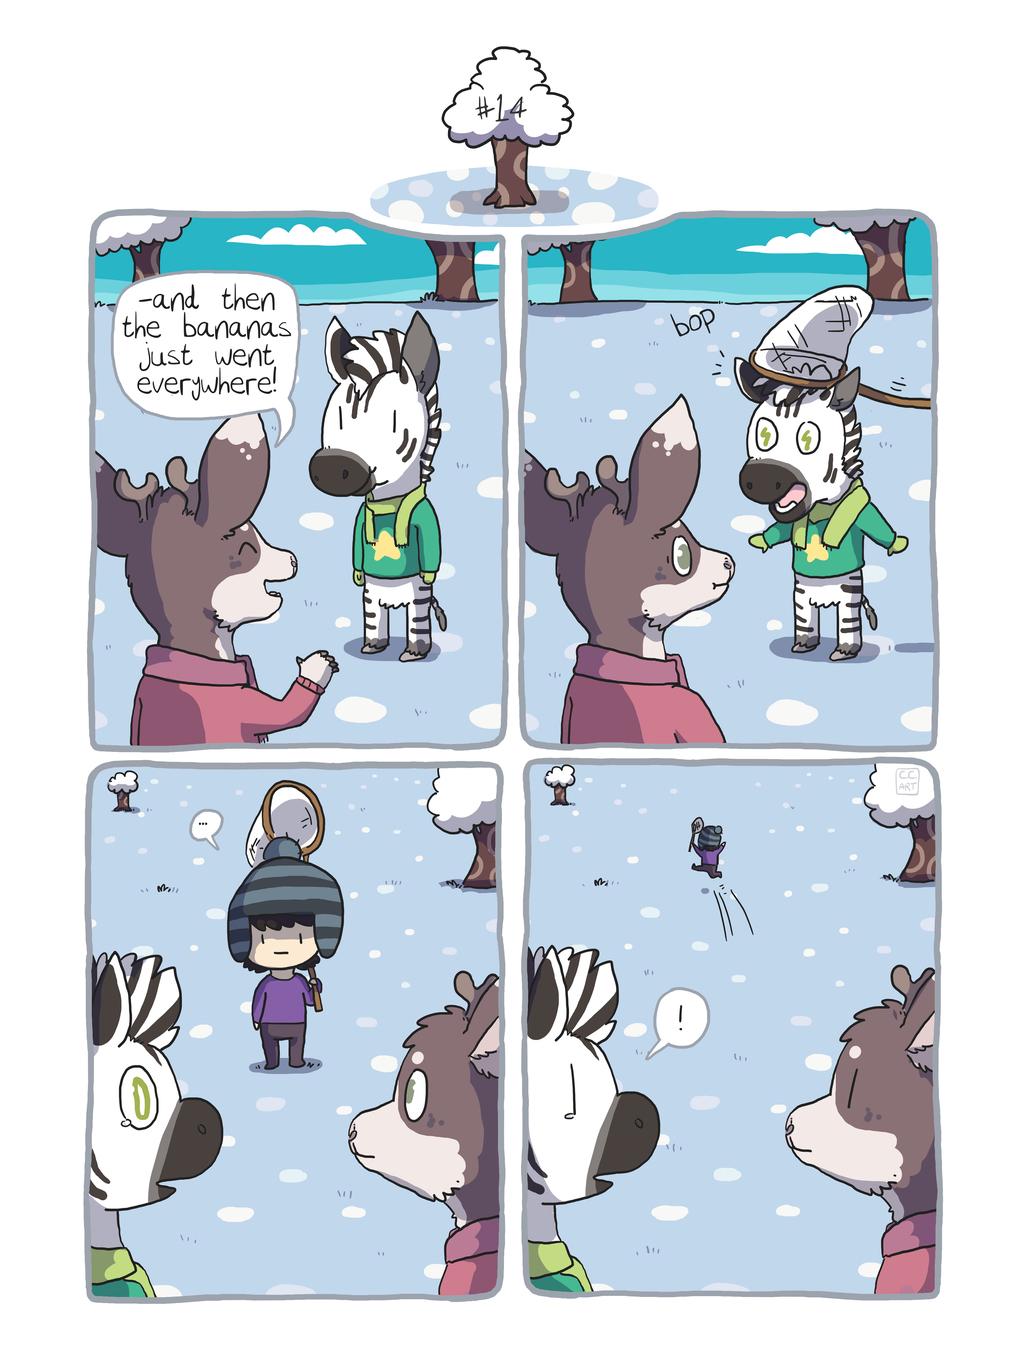 Zebra Crossing #14 [comic]